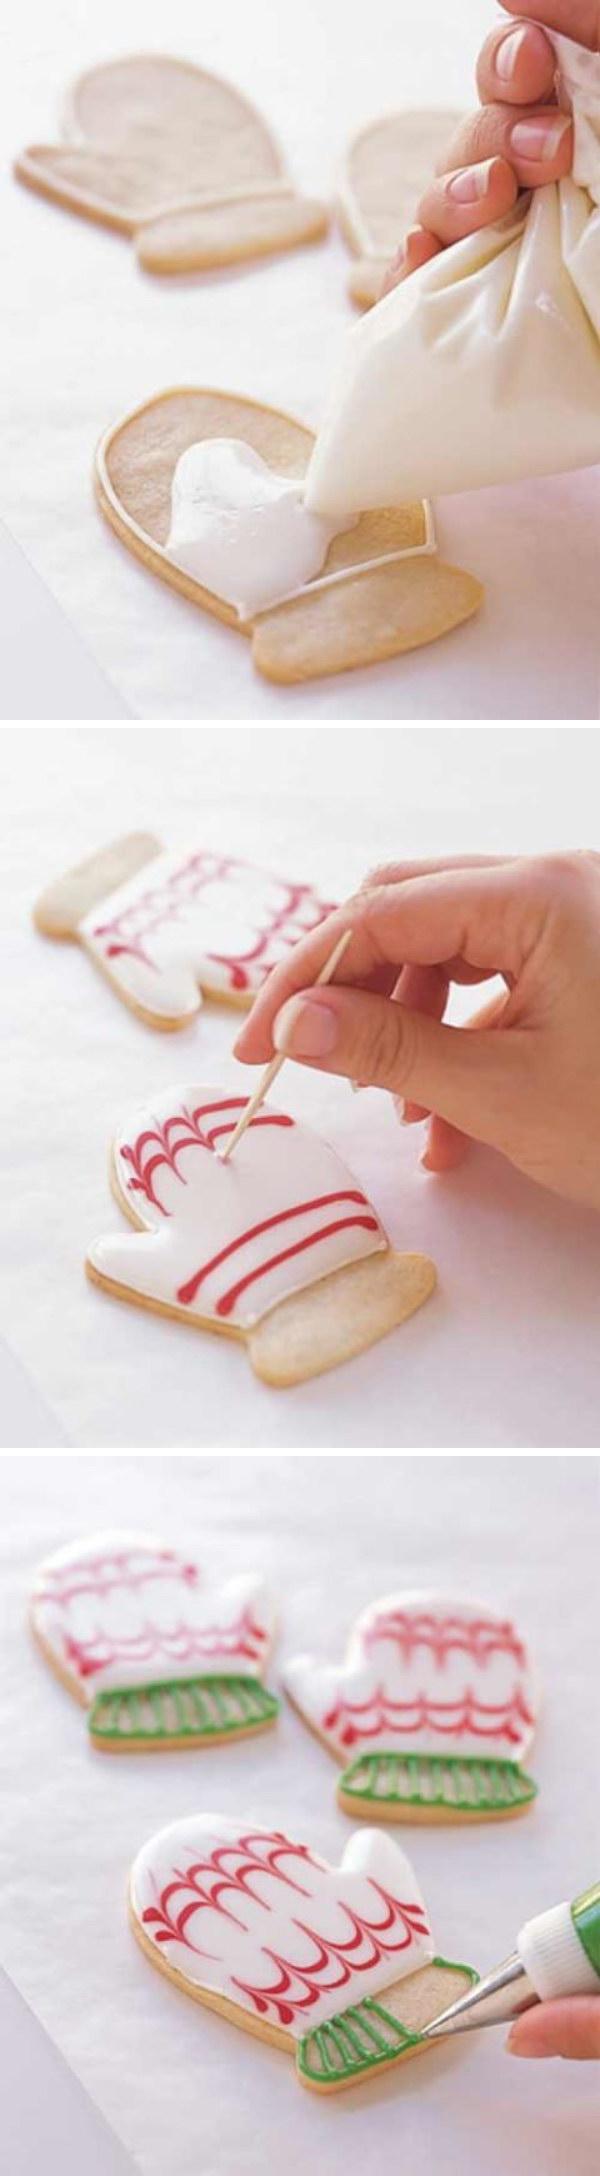 Homemade Glove Cookies.